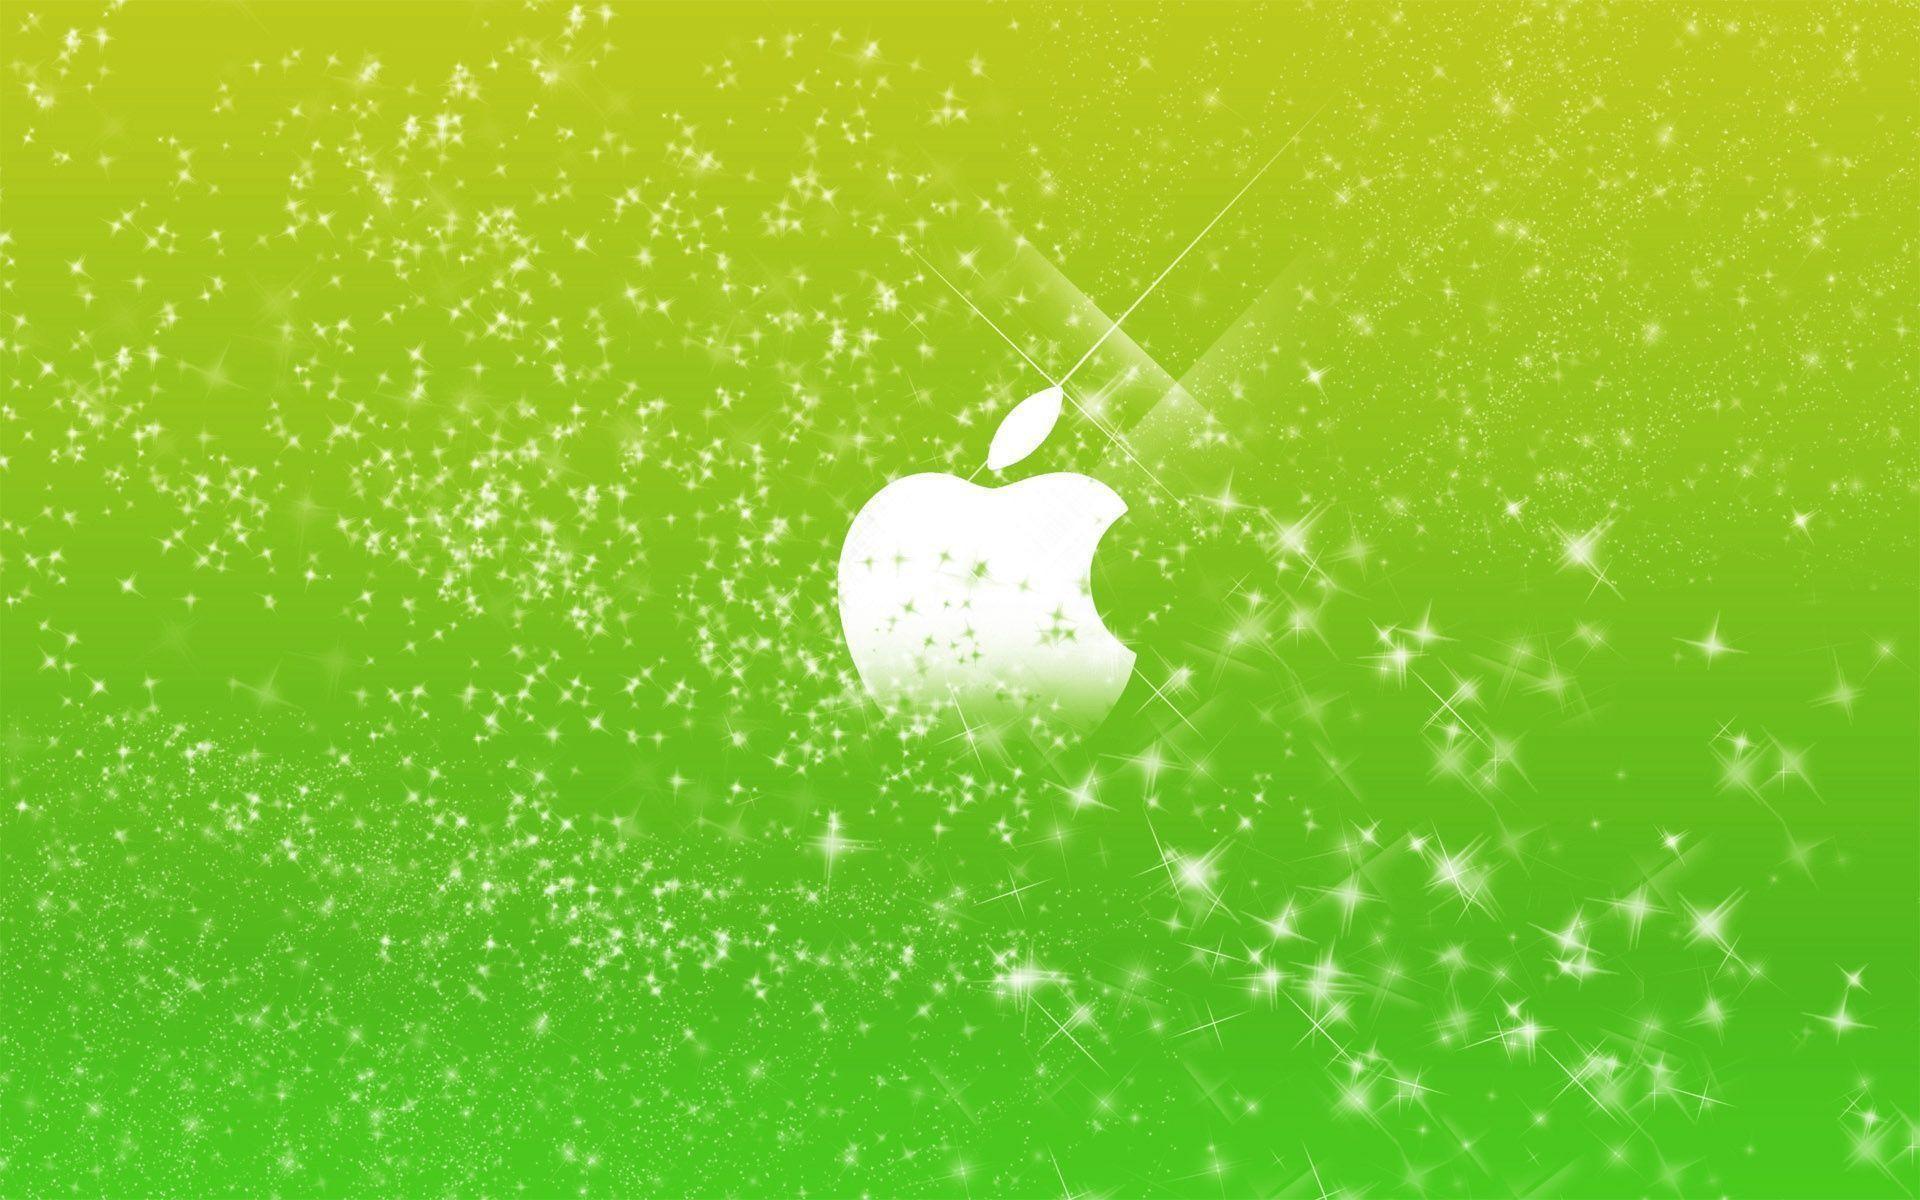 Glitter Wallpapers – Full HD wallpaper search